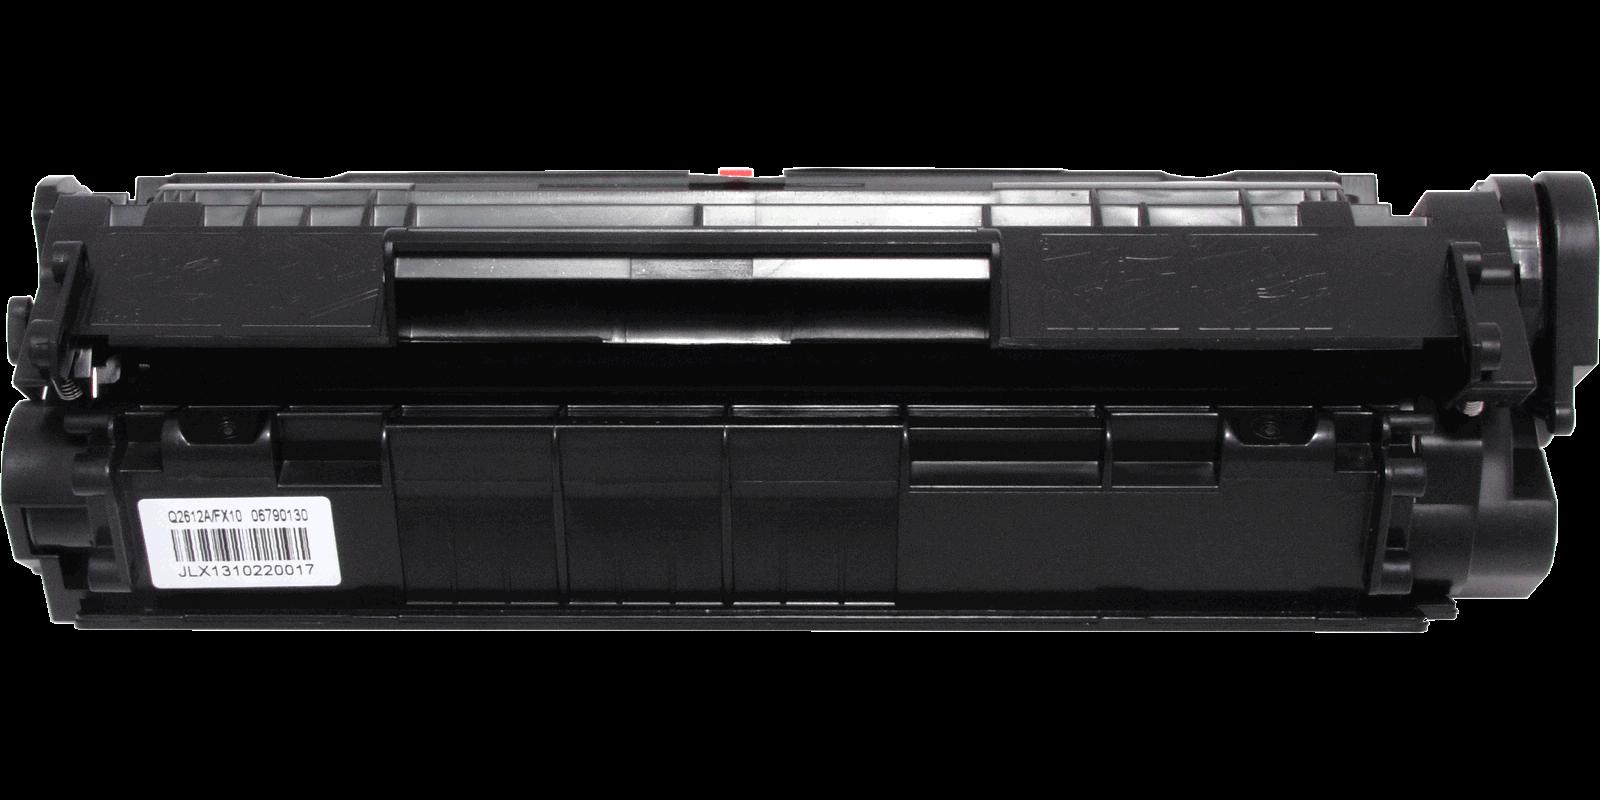 ULTRA FX9/FX10-104/304, черный, для Canon, до 2000 стр.